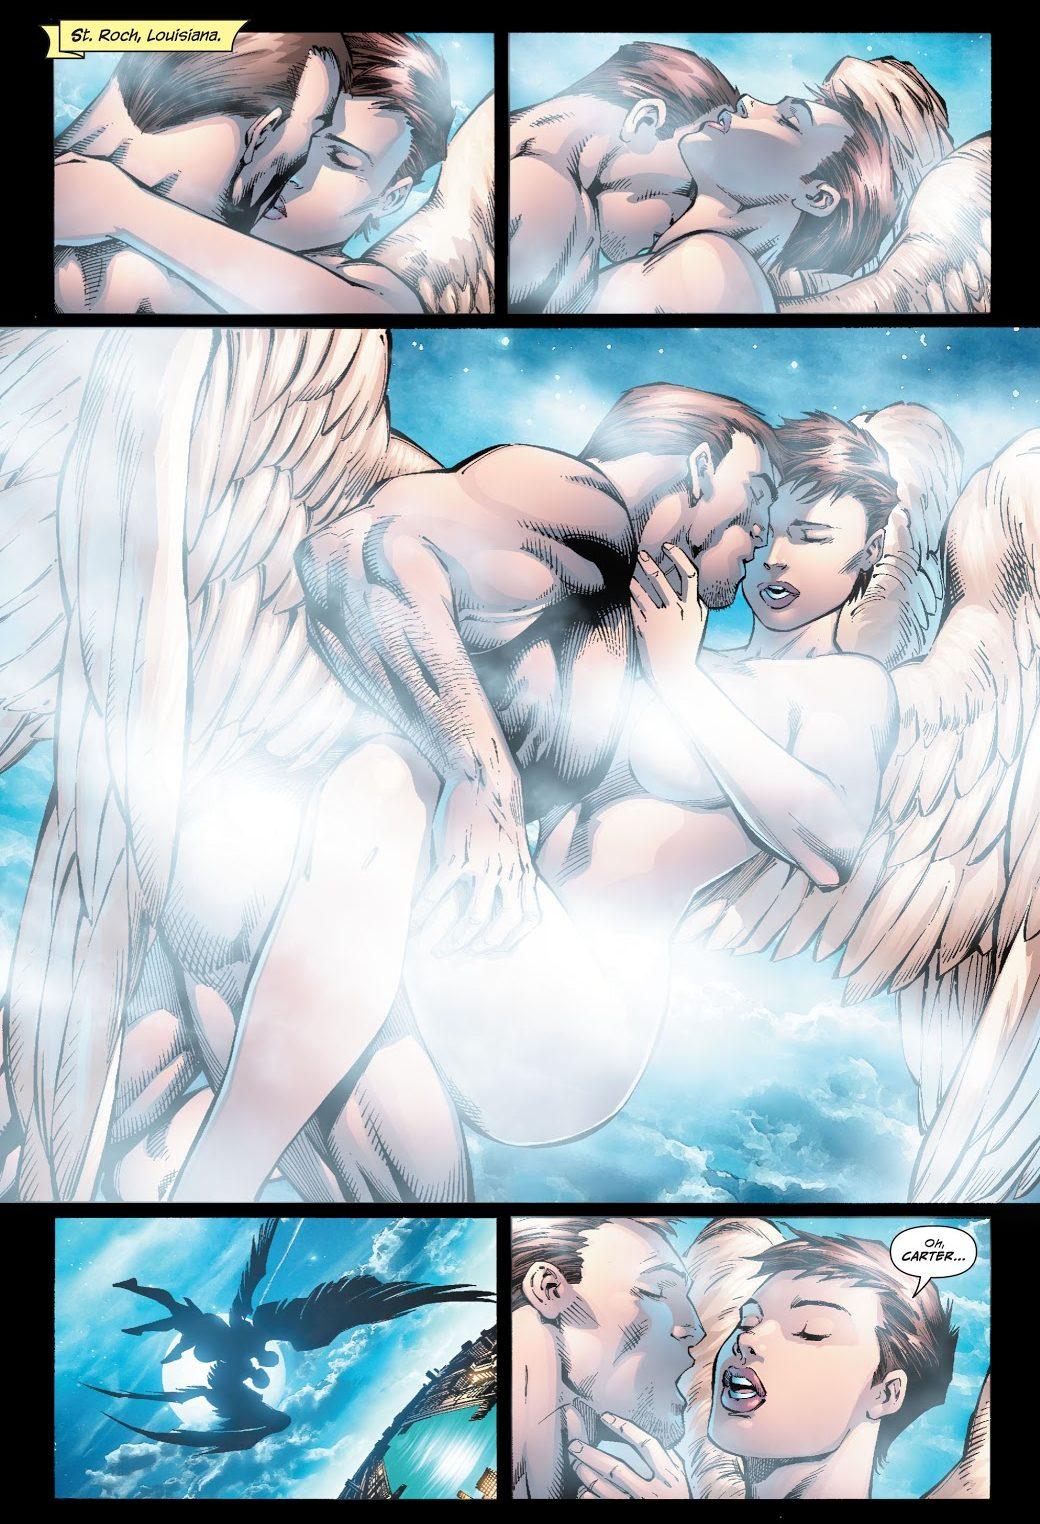 Hawkman And Hawkgirl (Justice League of America Vol. 2 #27)